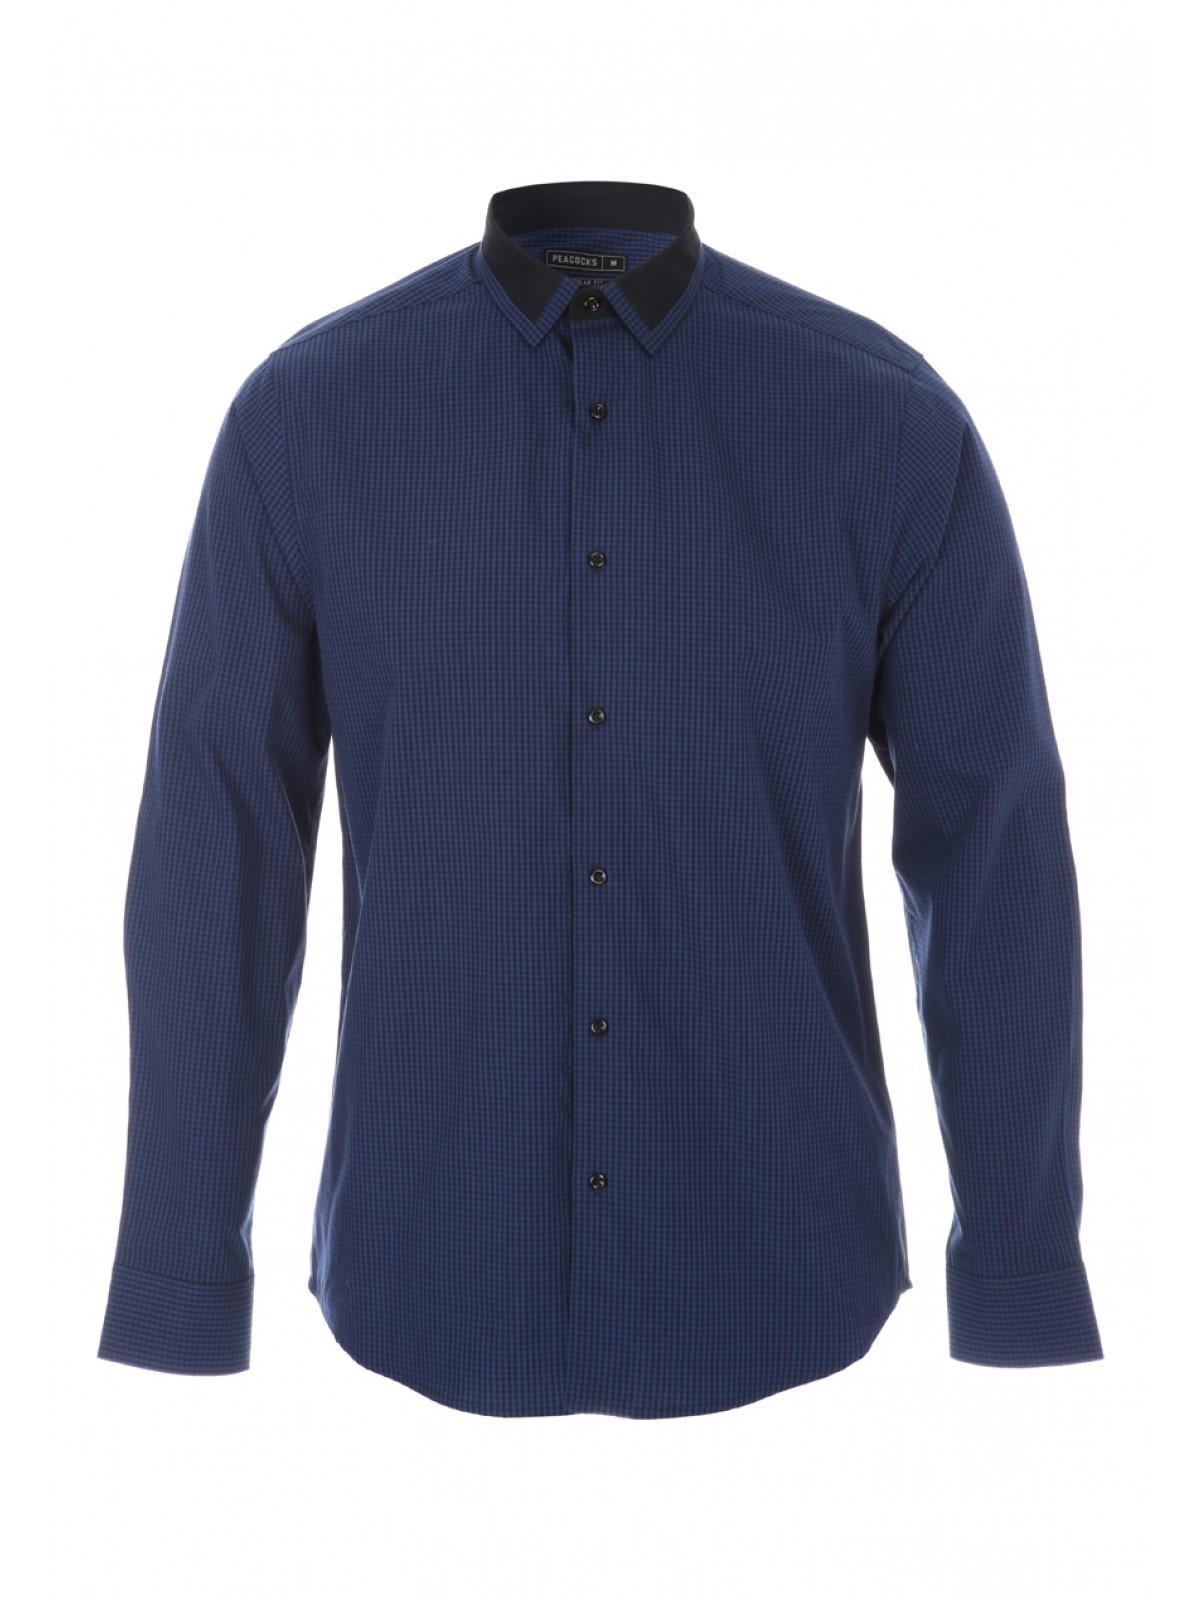 Modern Navy Blue Long Sleeve Formal Shirt